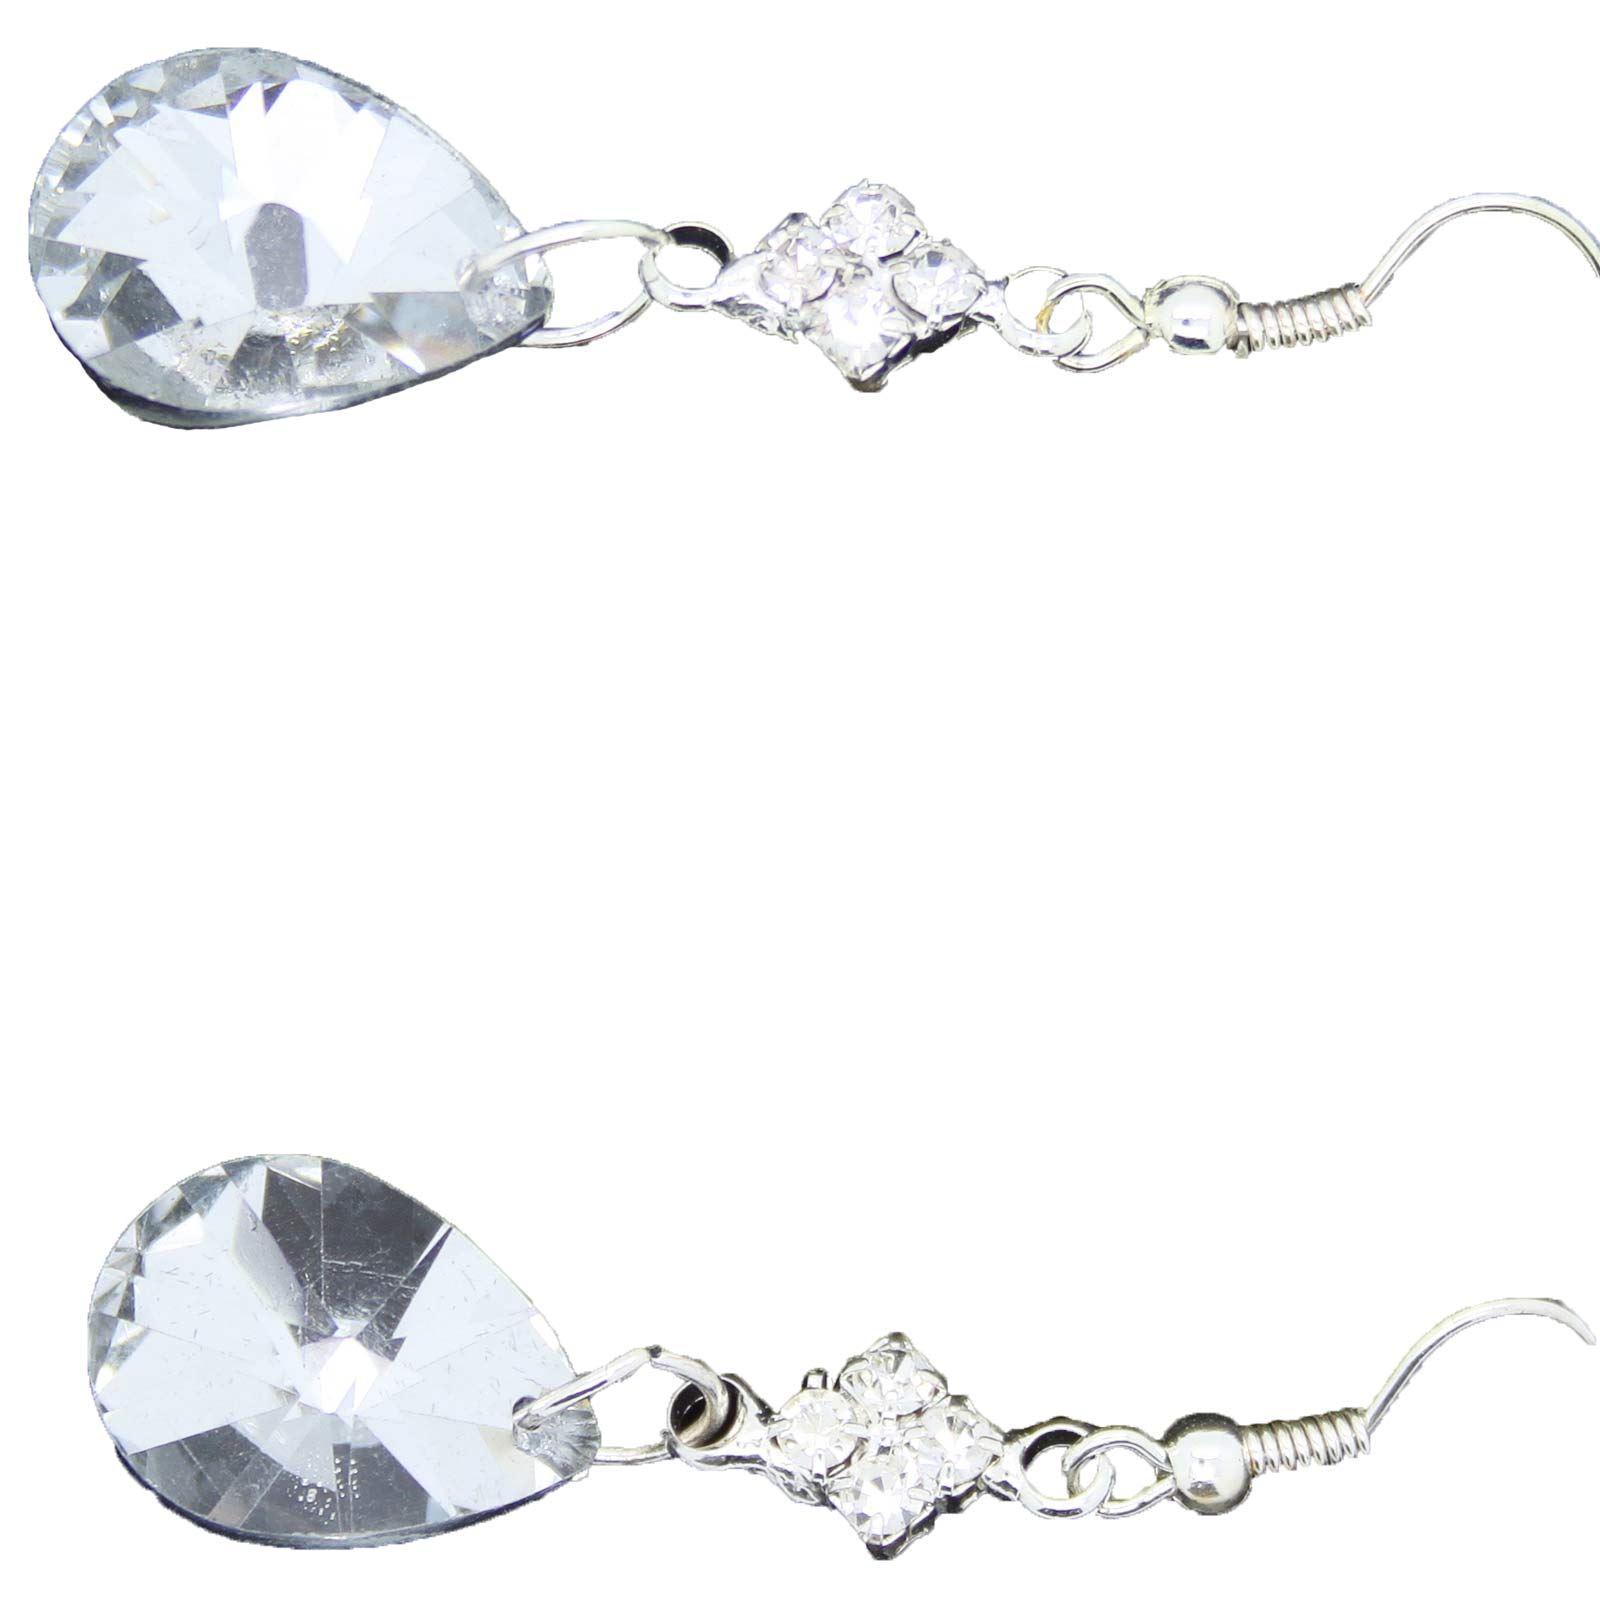 True-Face-Ladies-Women-039-s-Elegant-Earrings-Necklace-Set-Metal-Alloy-Jewellery thumbnail 47